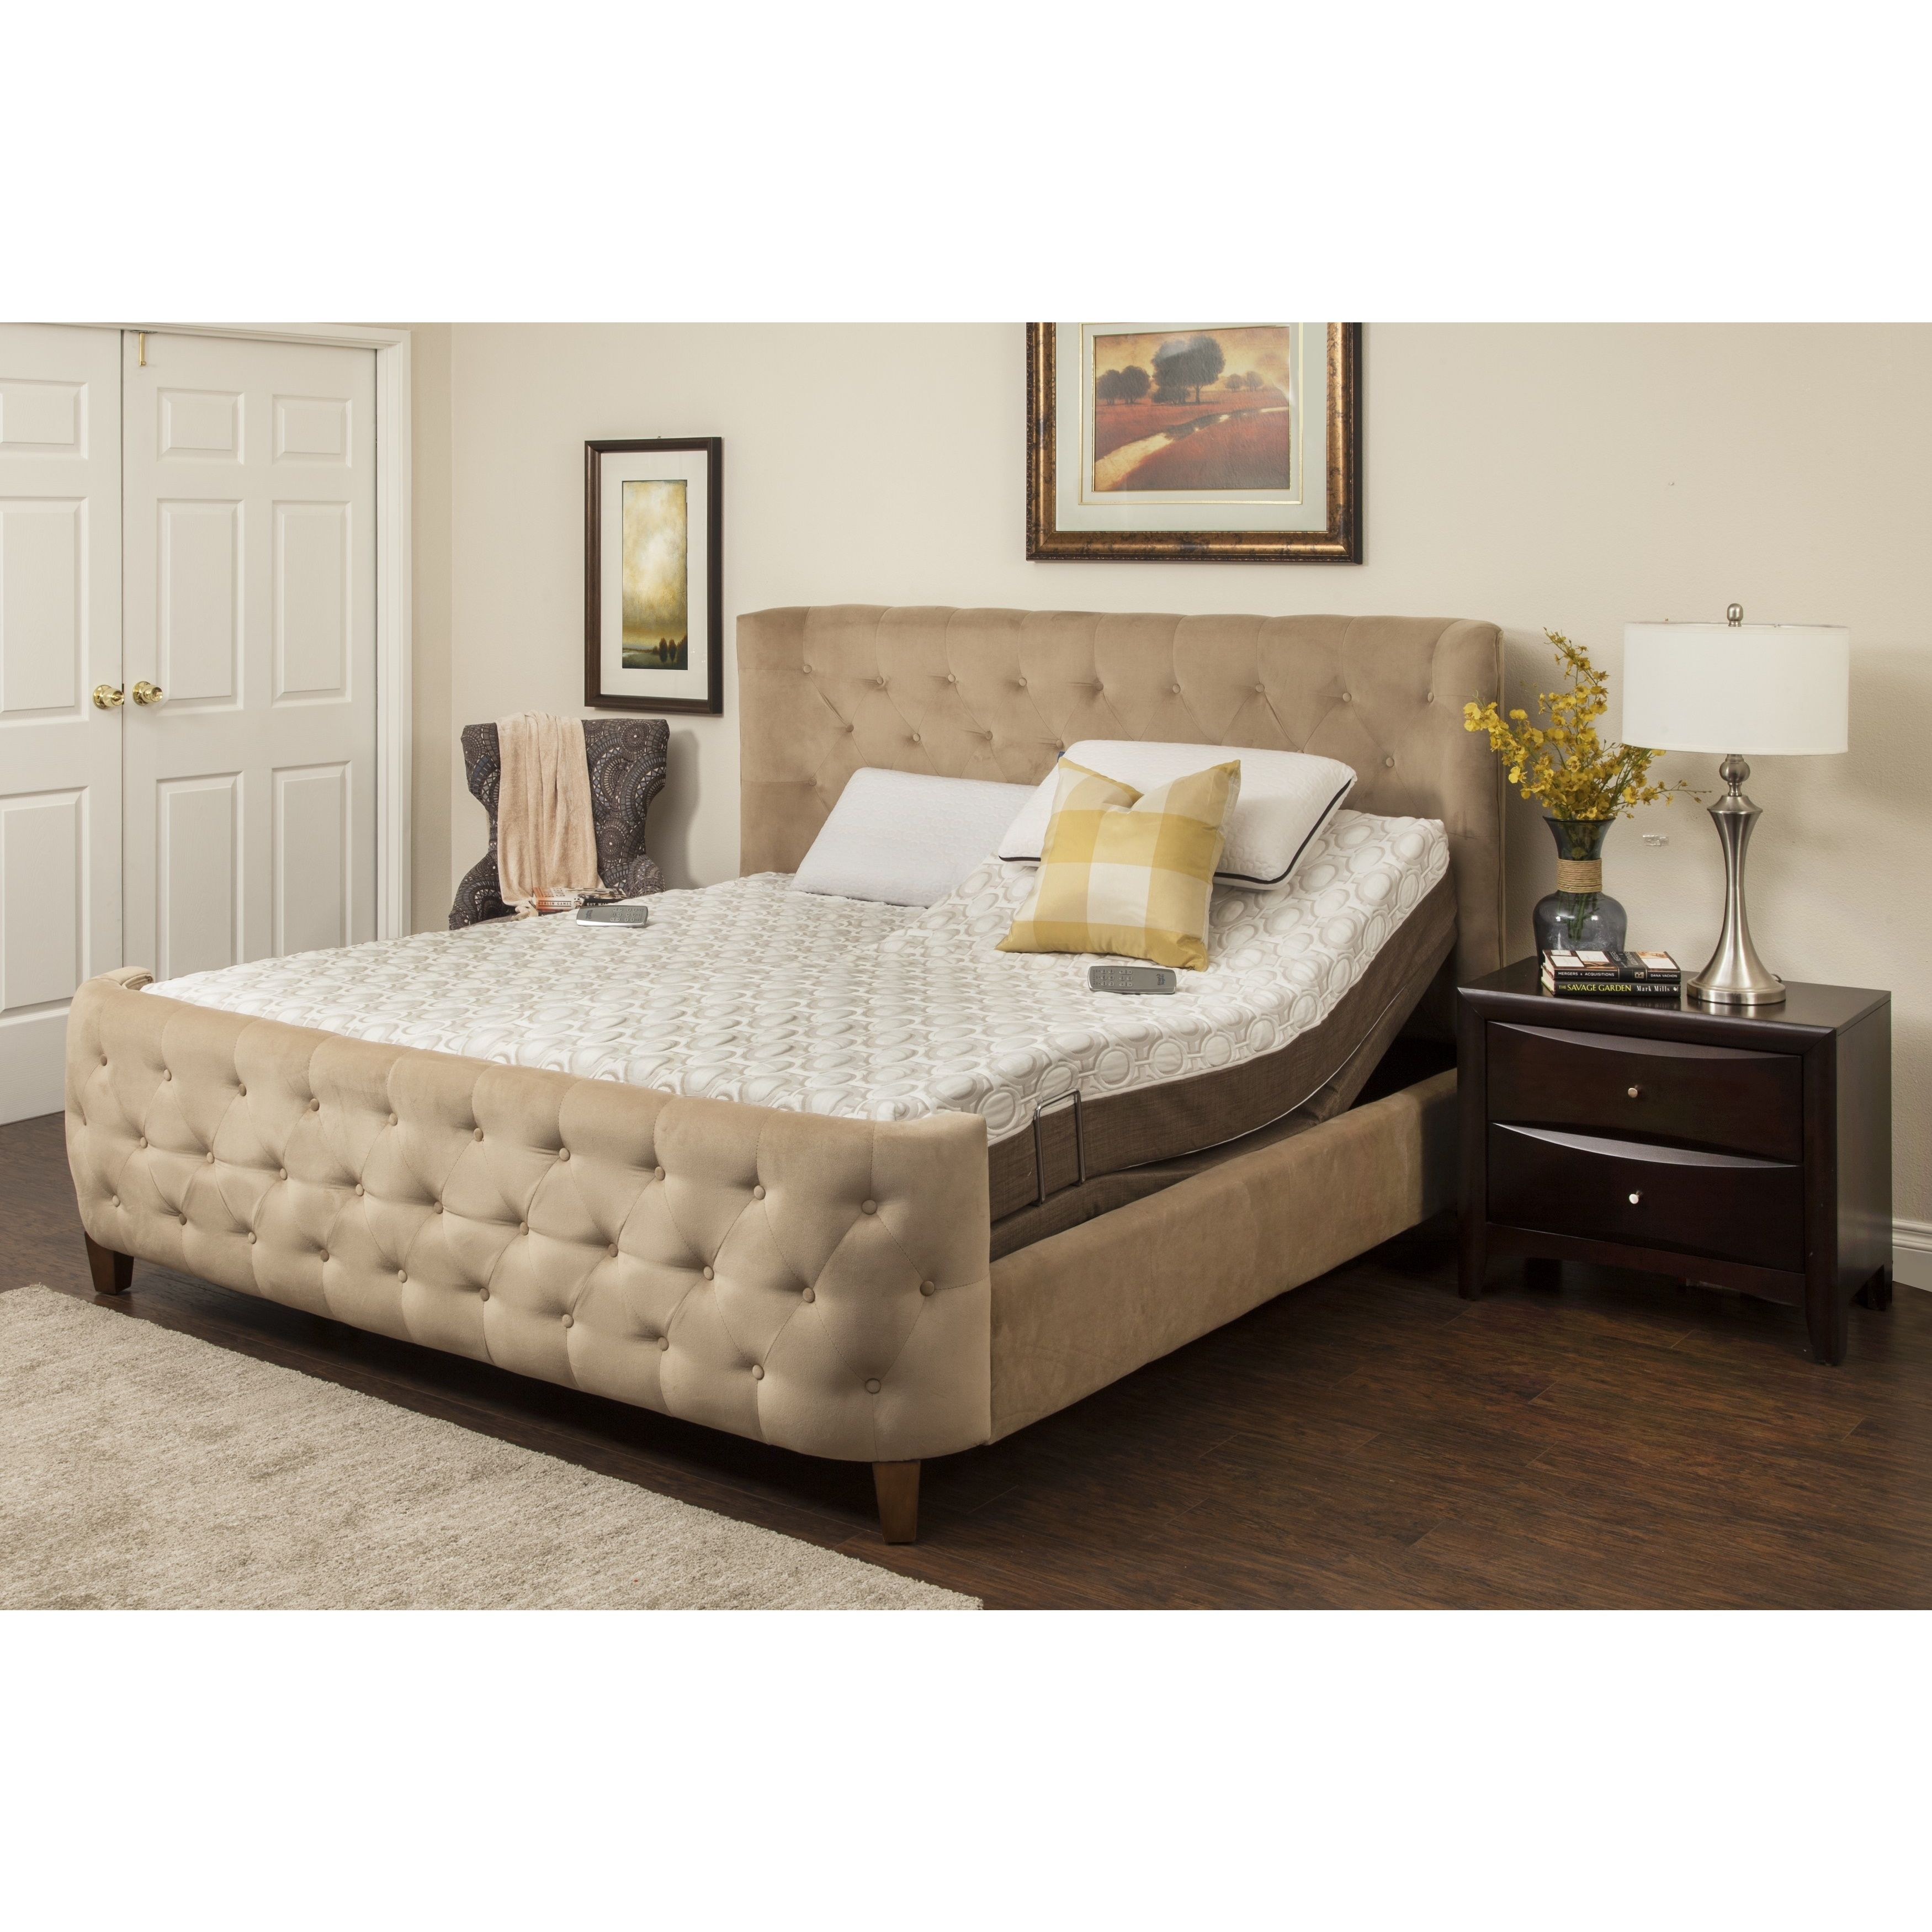 Sleep Zone Peony 10inch Memory Foam Mattress and